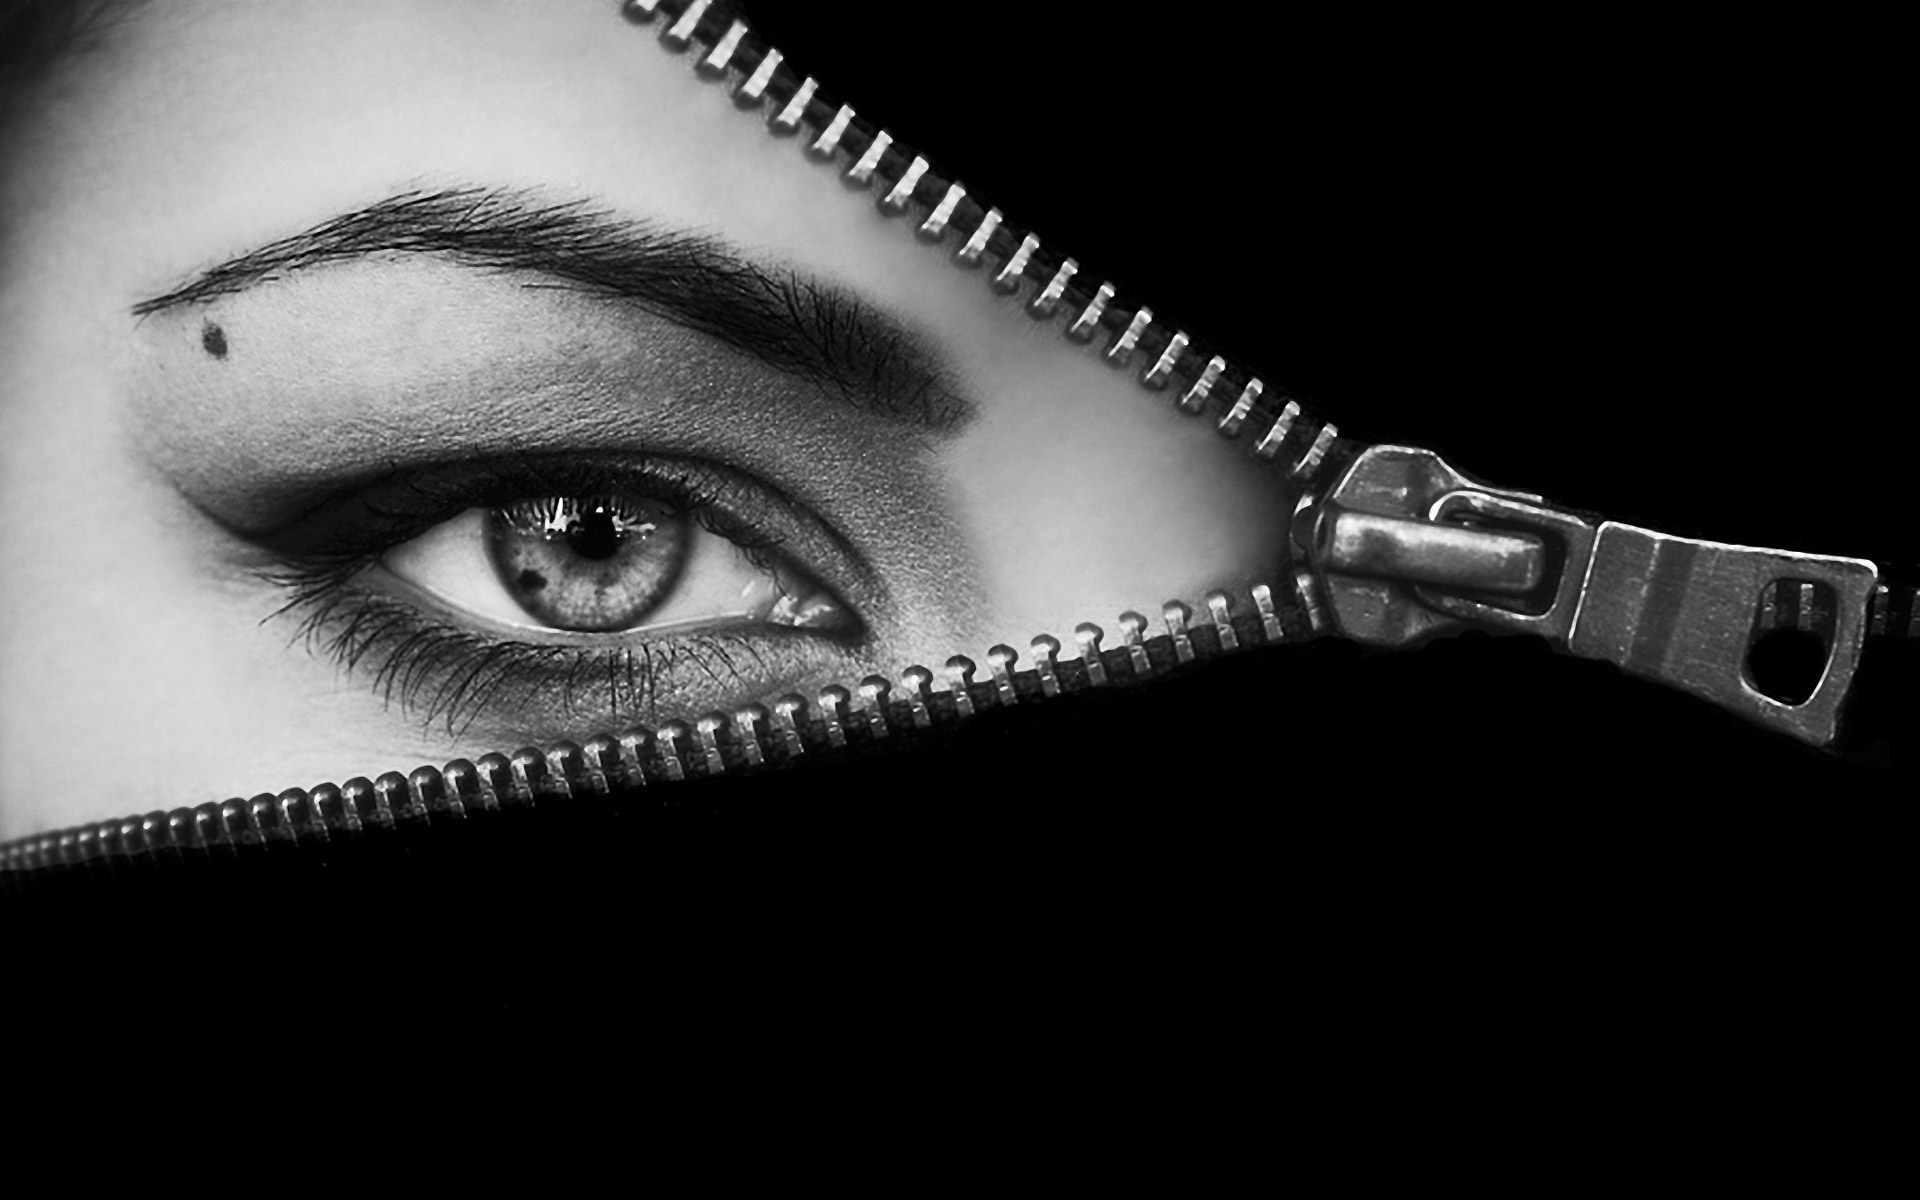 the eye wallpaper #22